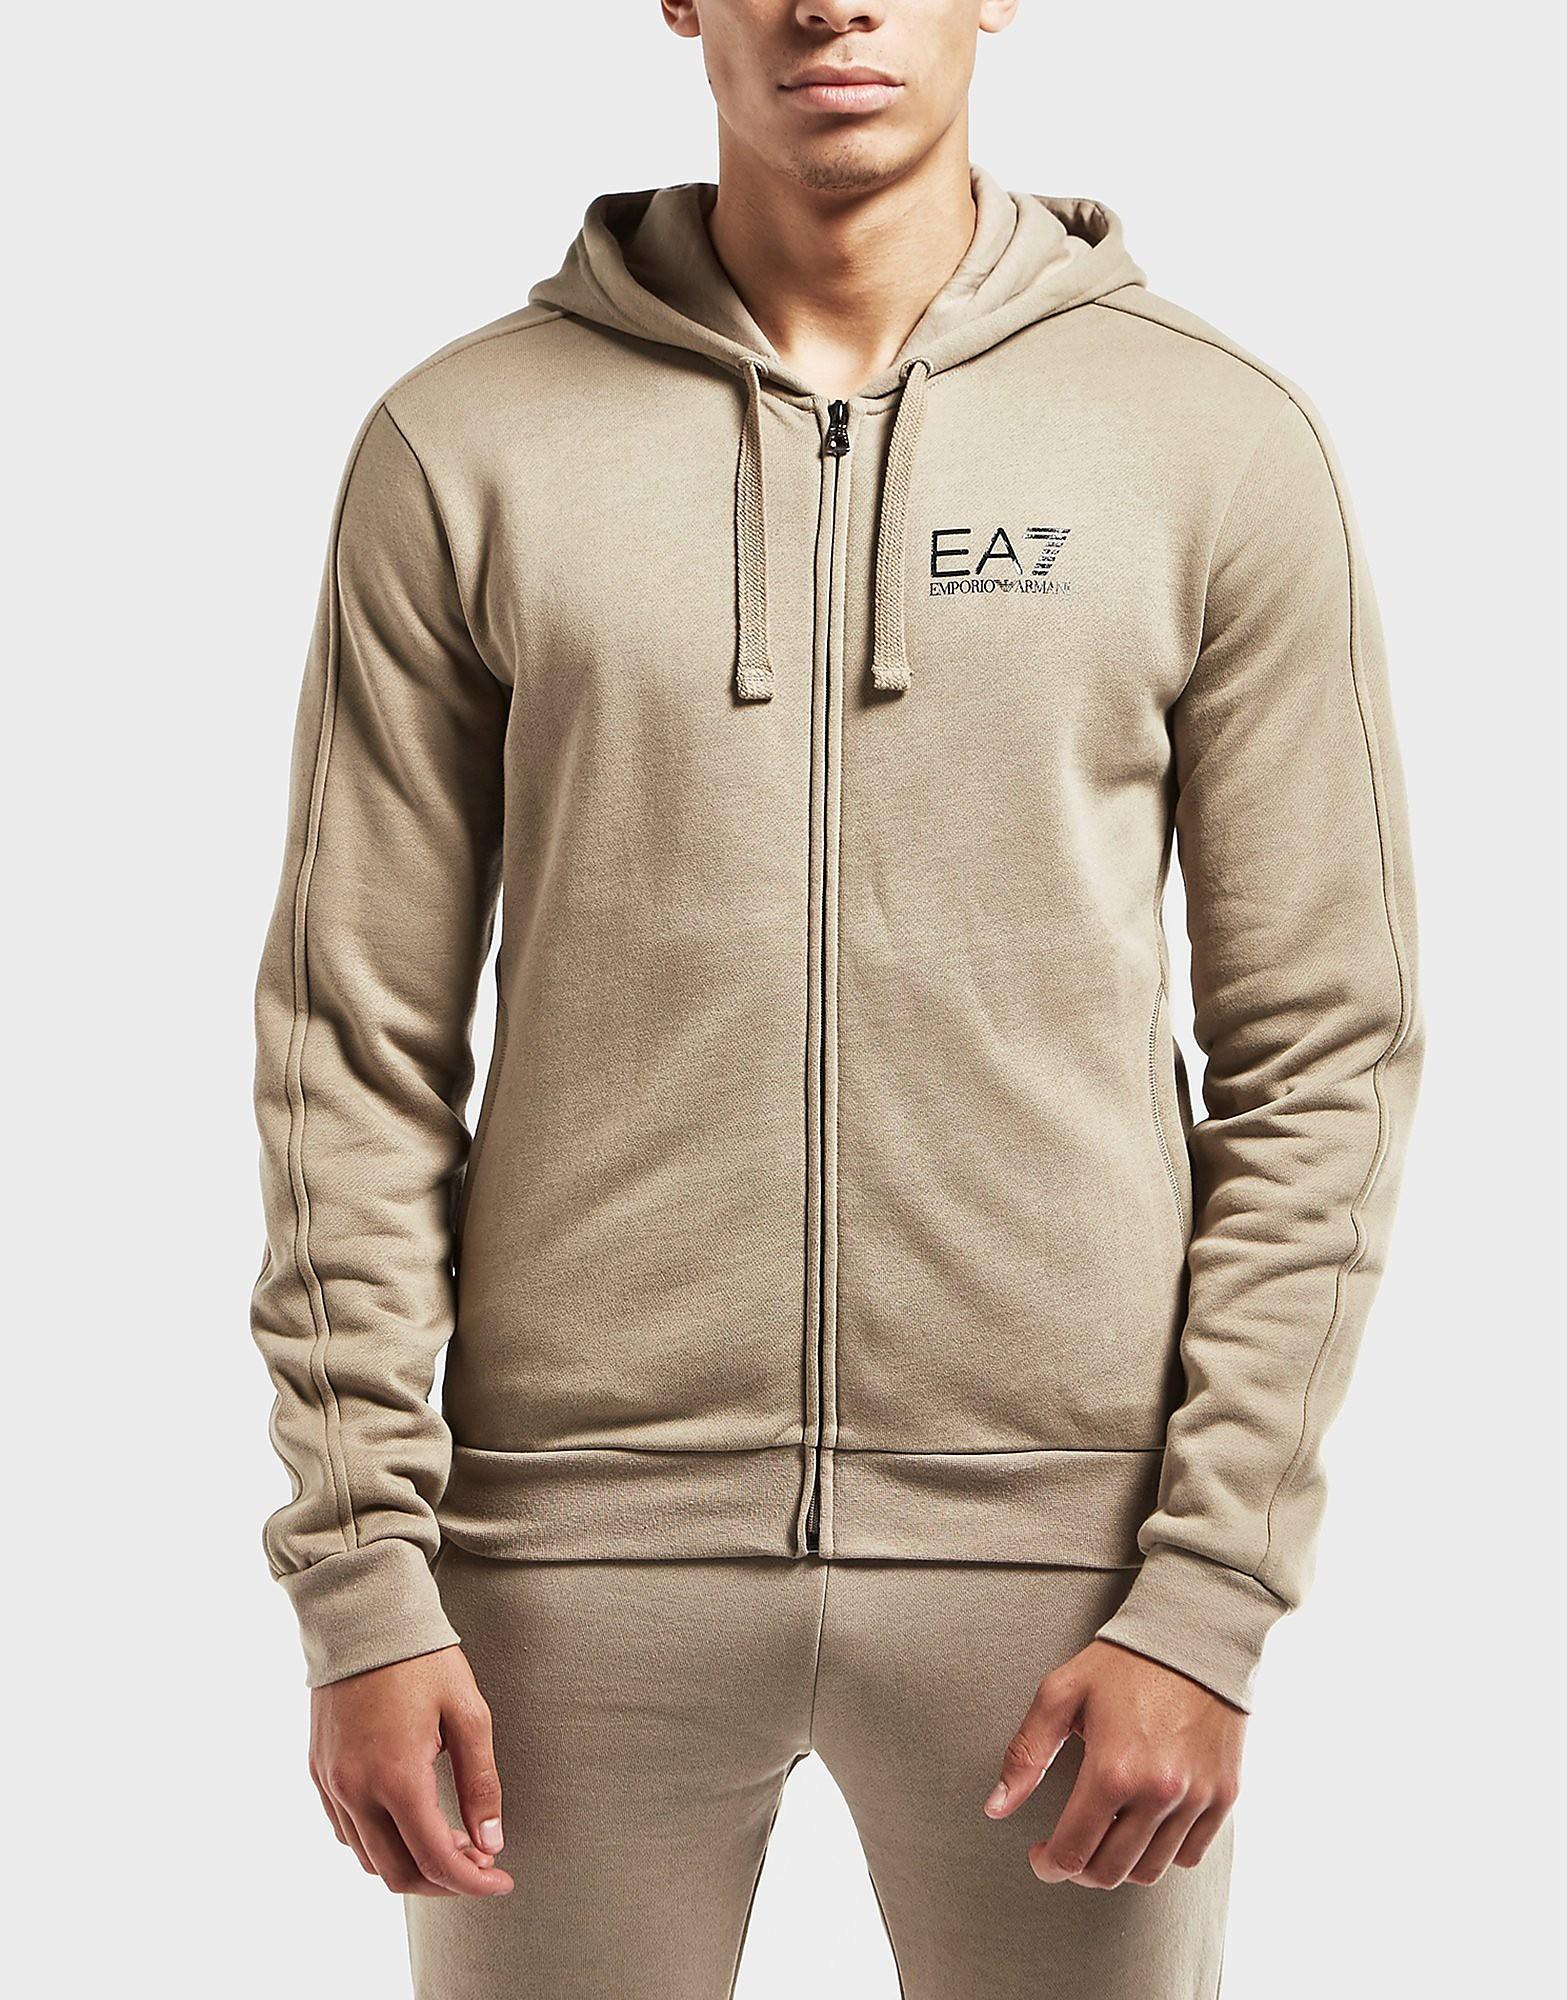 Emporio Armani EA7 Core Full Zip Hoody